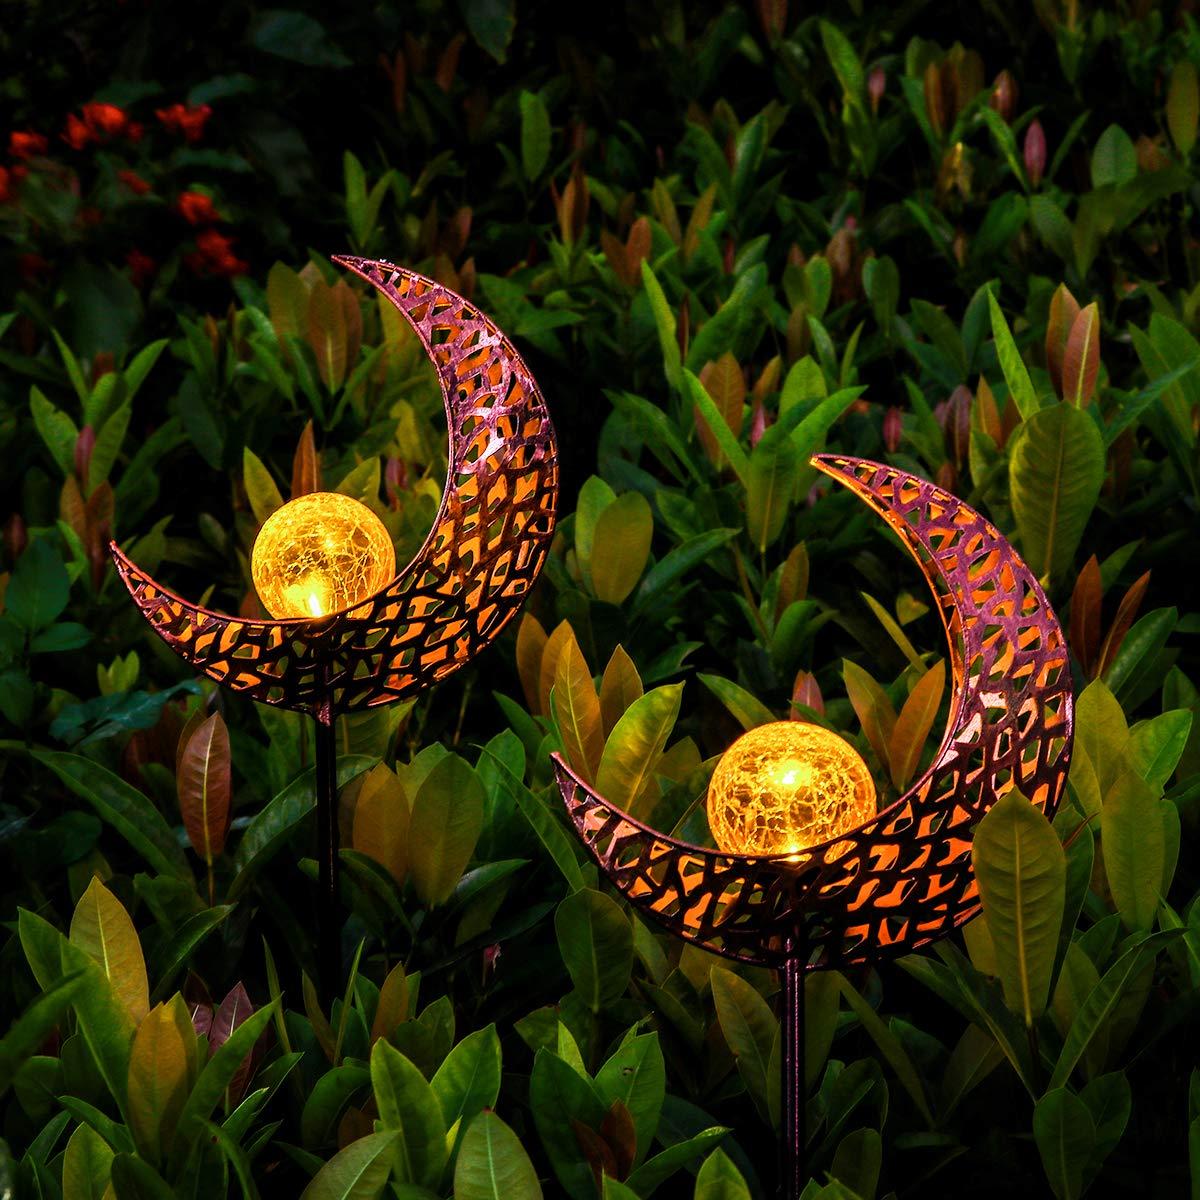 YUNLIGHTS Solar Garden Lights Outdoor, 2 Pack Moon Crackle Glass Globe Solar Stake Lights, IP64 Waterproof LED Solar Powered Garden Lights for Garden Patio Lawn Backyard Pathway Decoration(Warm White)